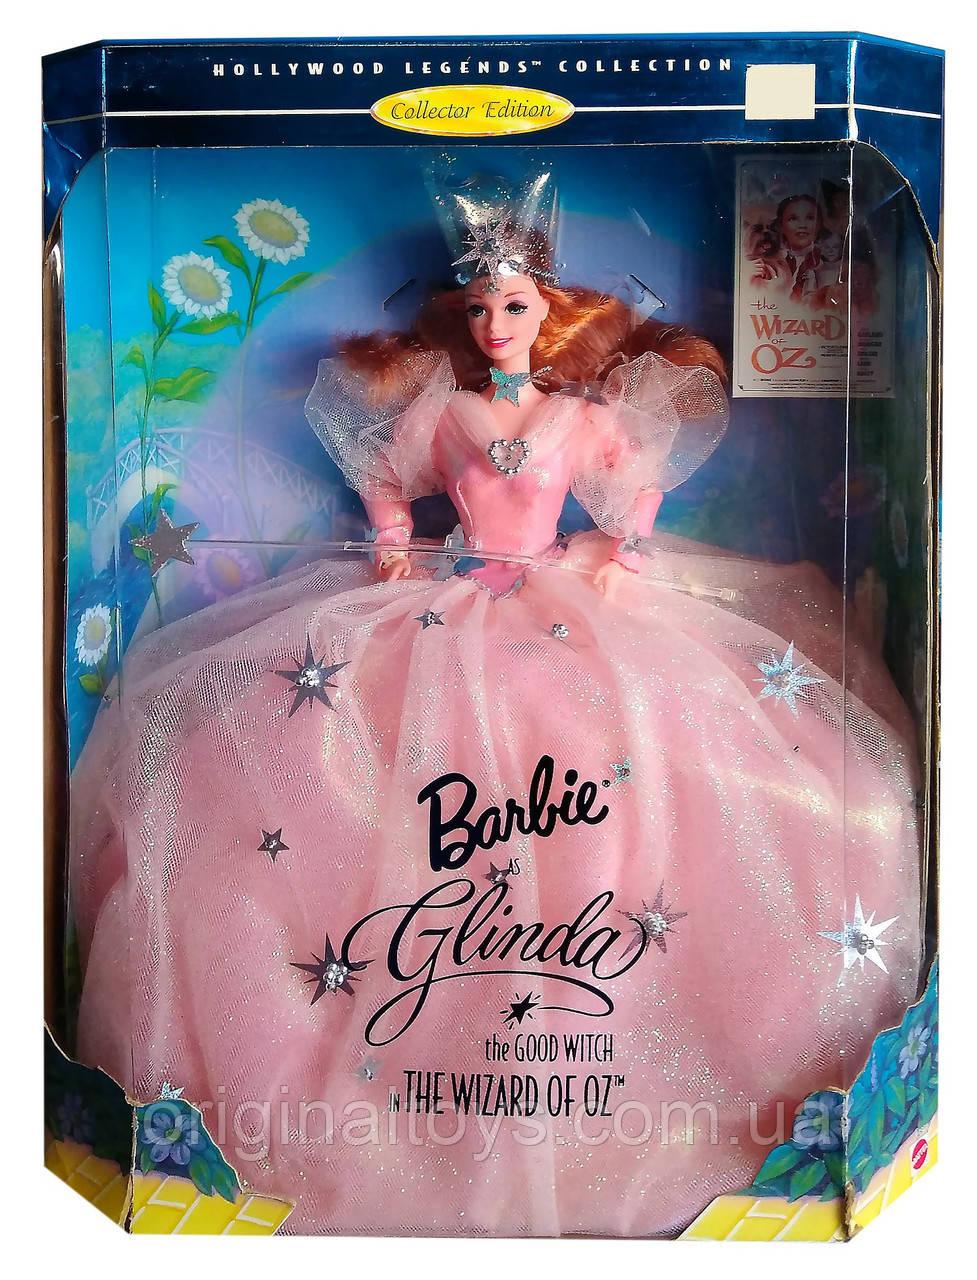 Коллекционная кукла Барби Глинда Волшебник страны Оз Barbie Glinda The Wizard of Oz 1995 Mattel 14901